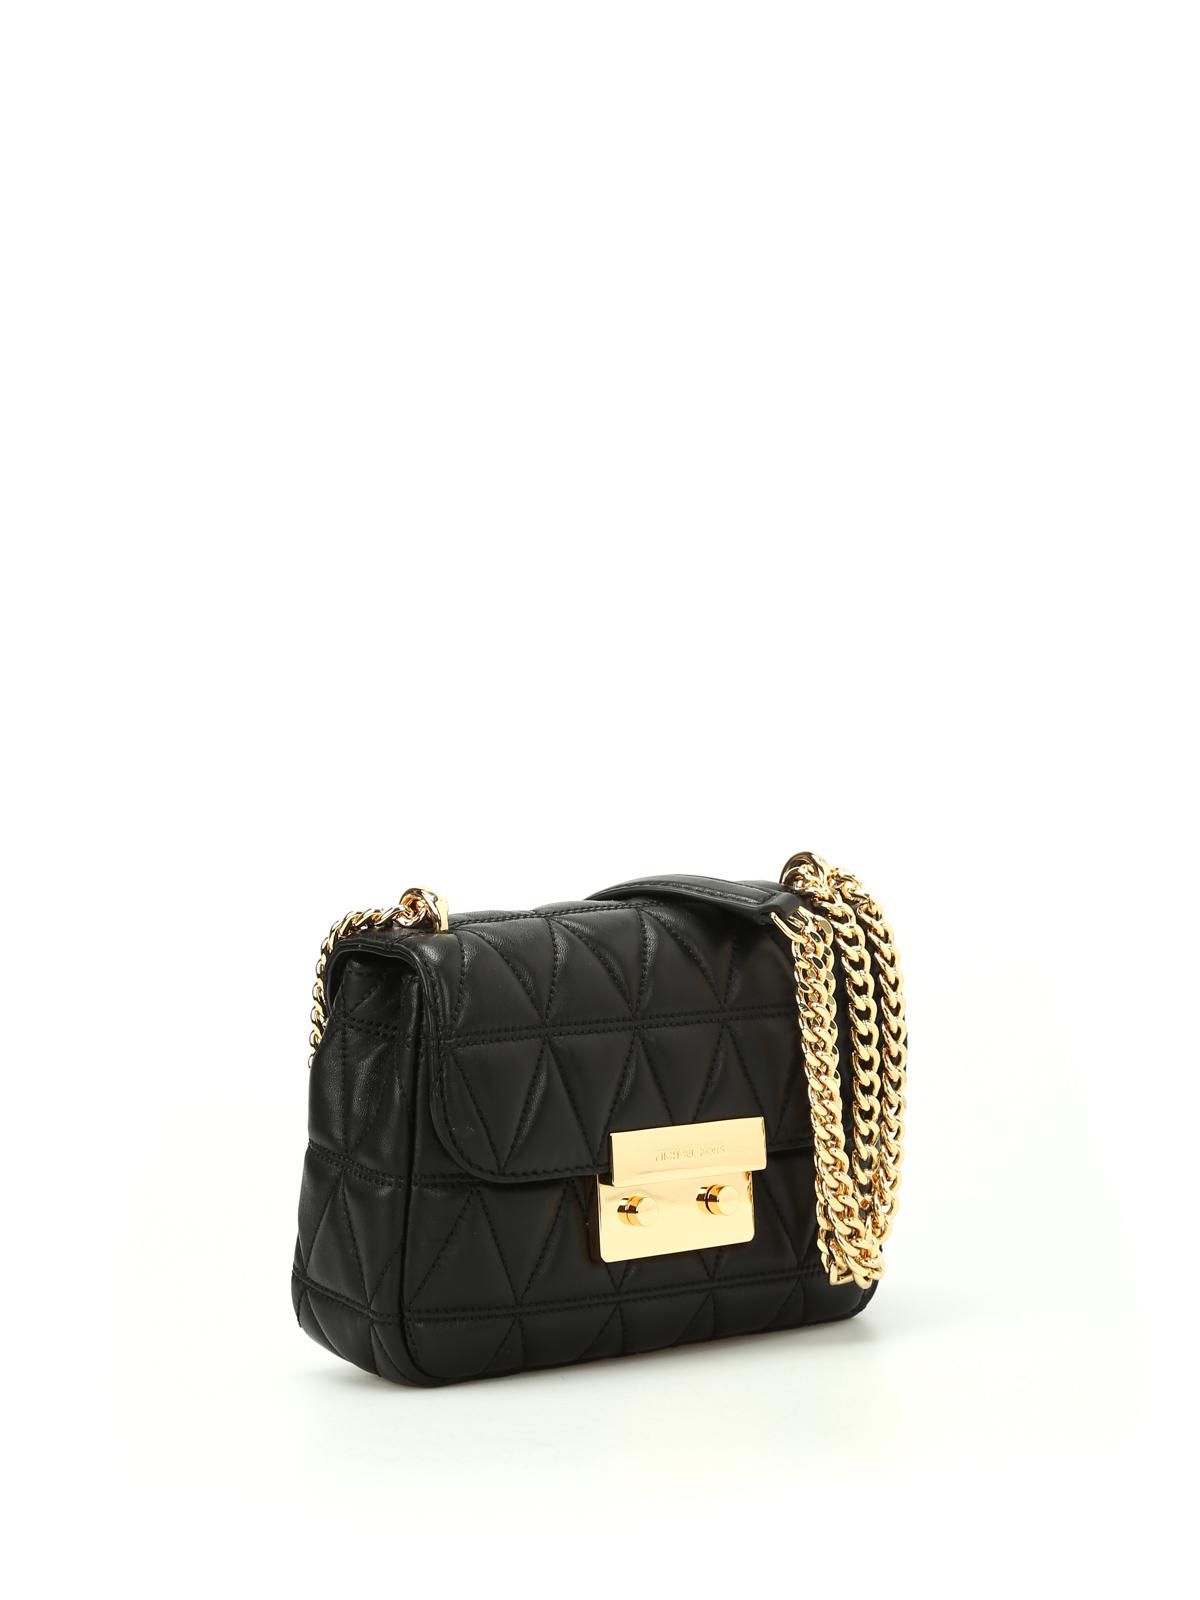 c3cc483054b5 MICHAEL KORS: shoulder bags online - Sloan quilted small shoulder bag